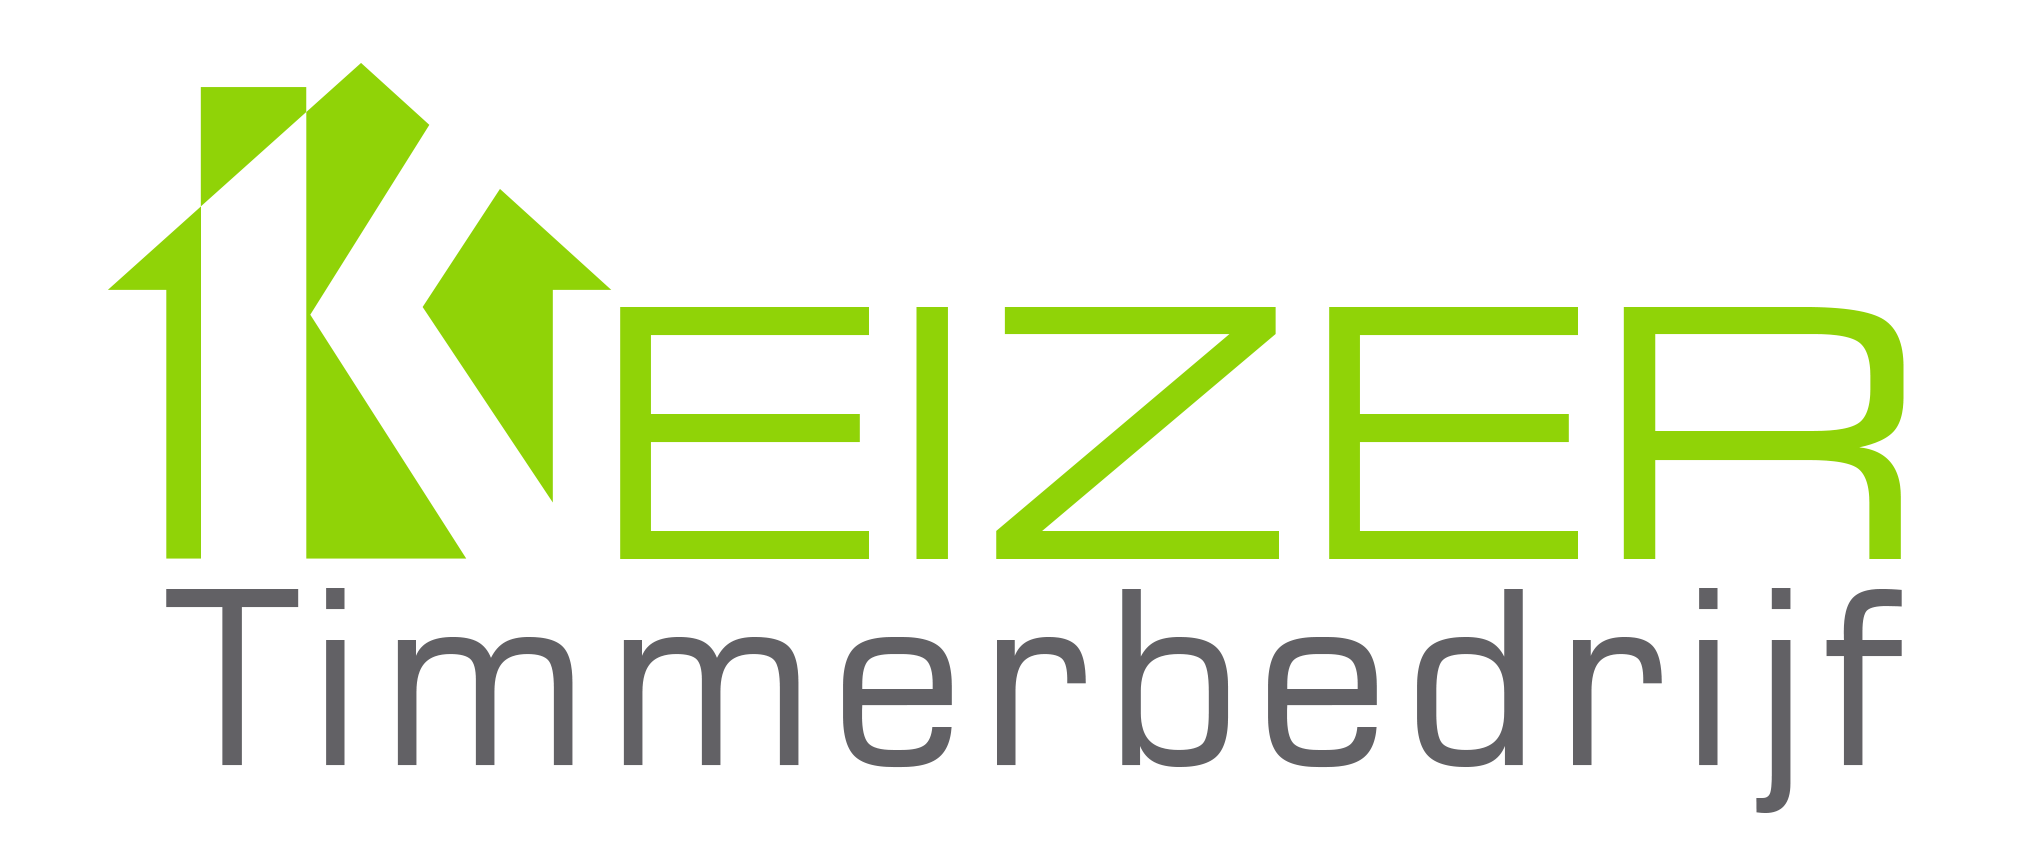 Timmerbedrijf Keizer logo